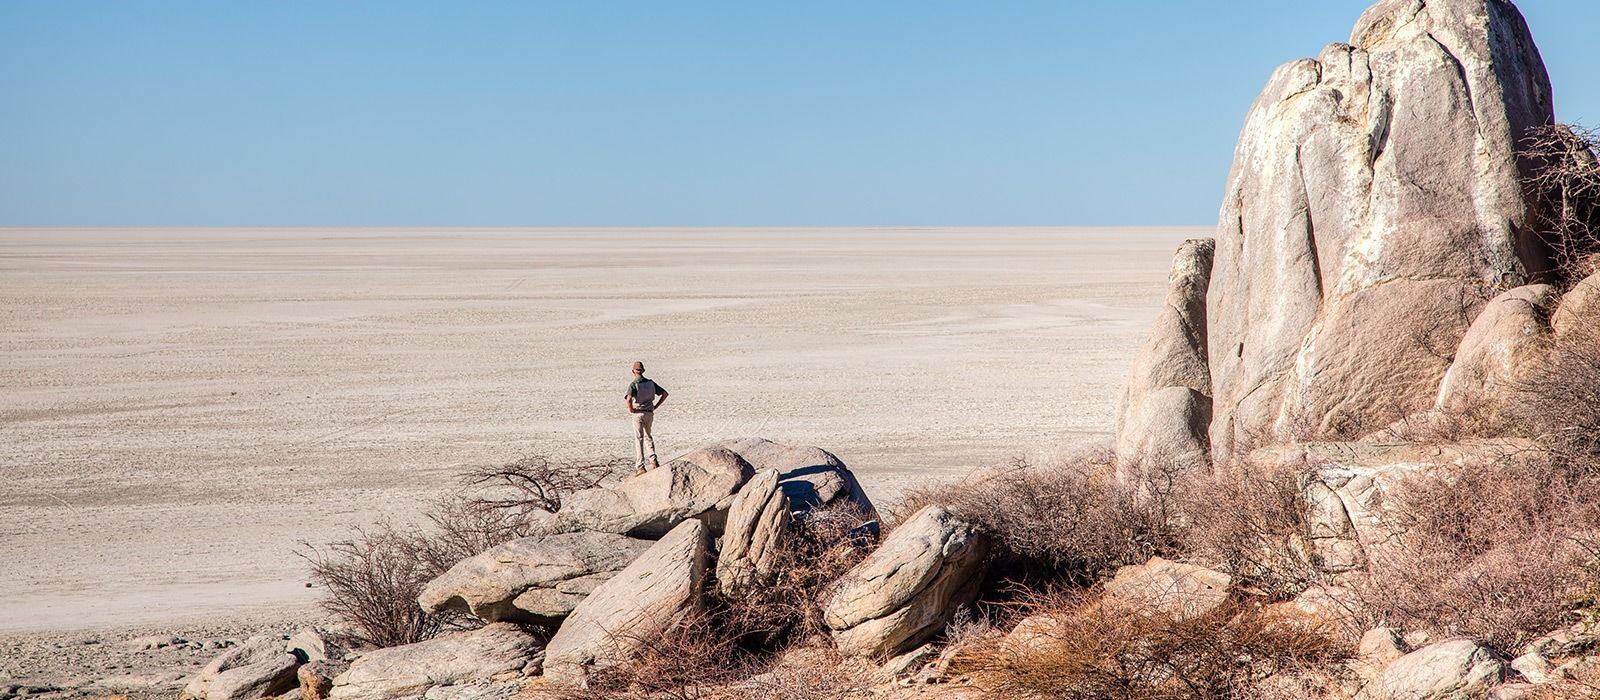 Botswana: Your Wildest Dreams Tour Trip 4